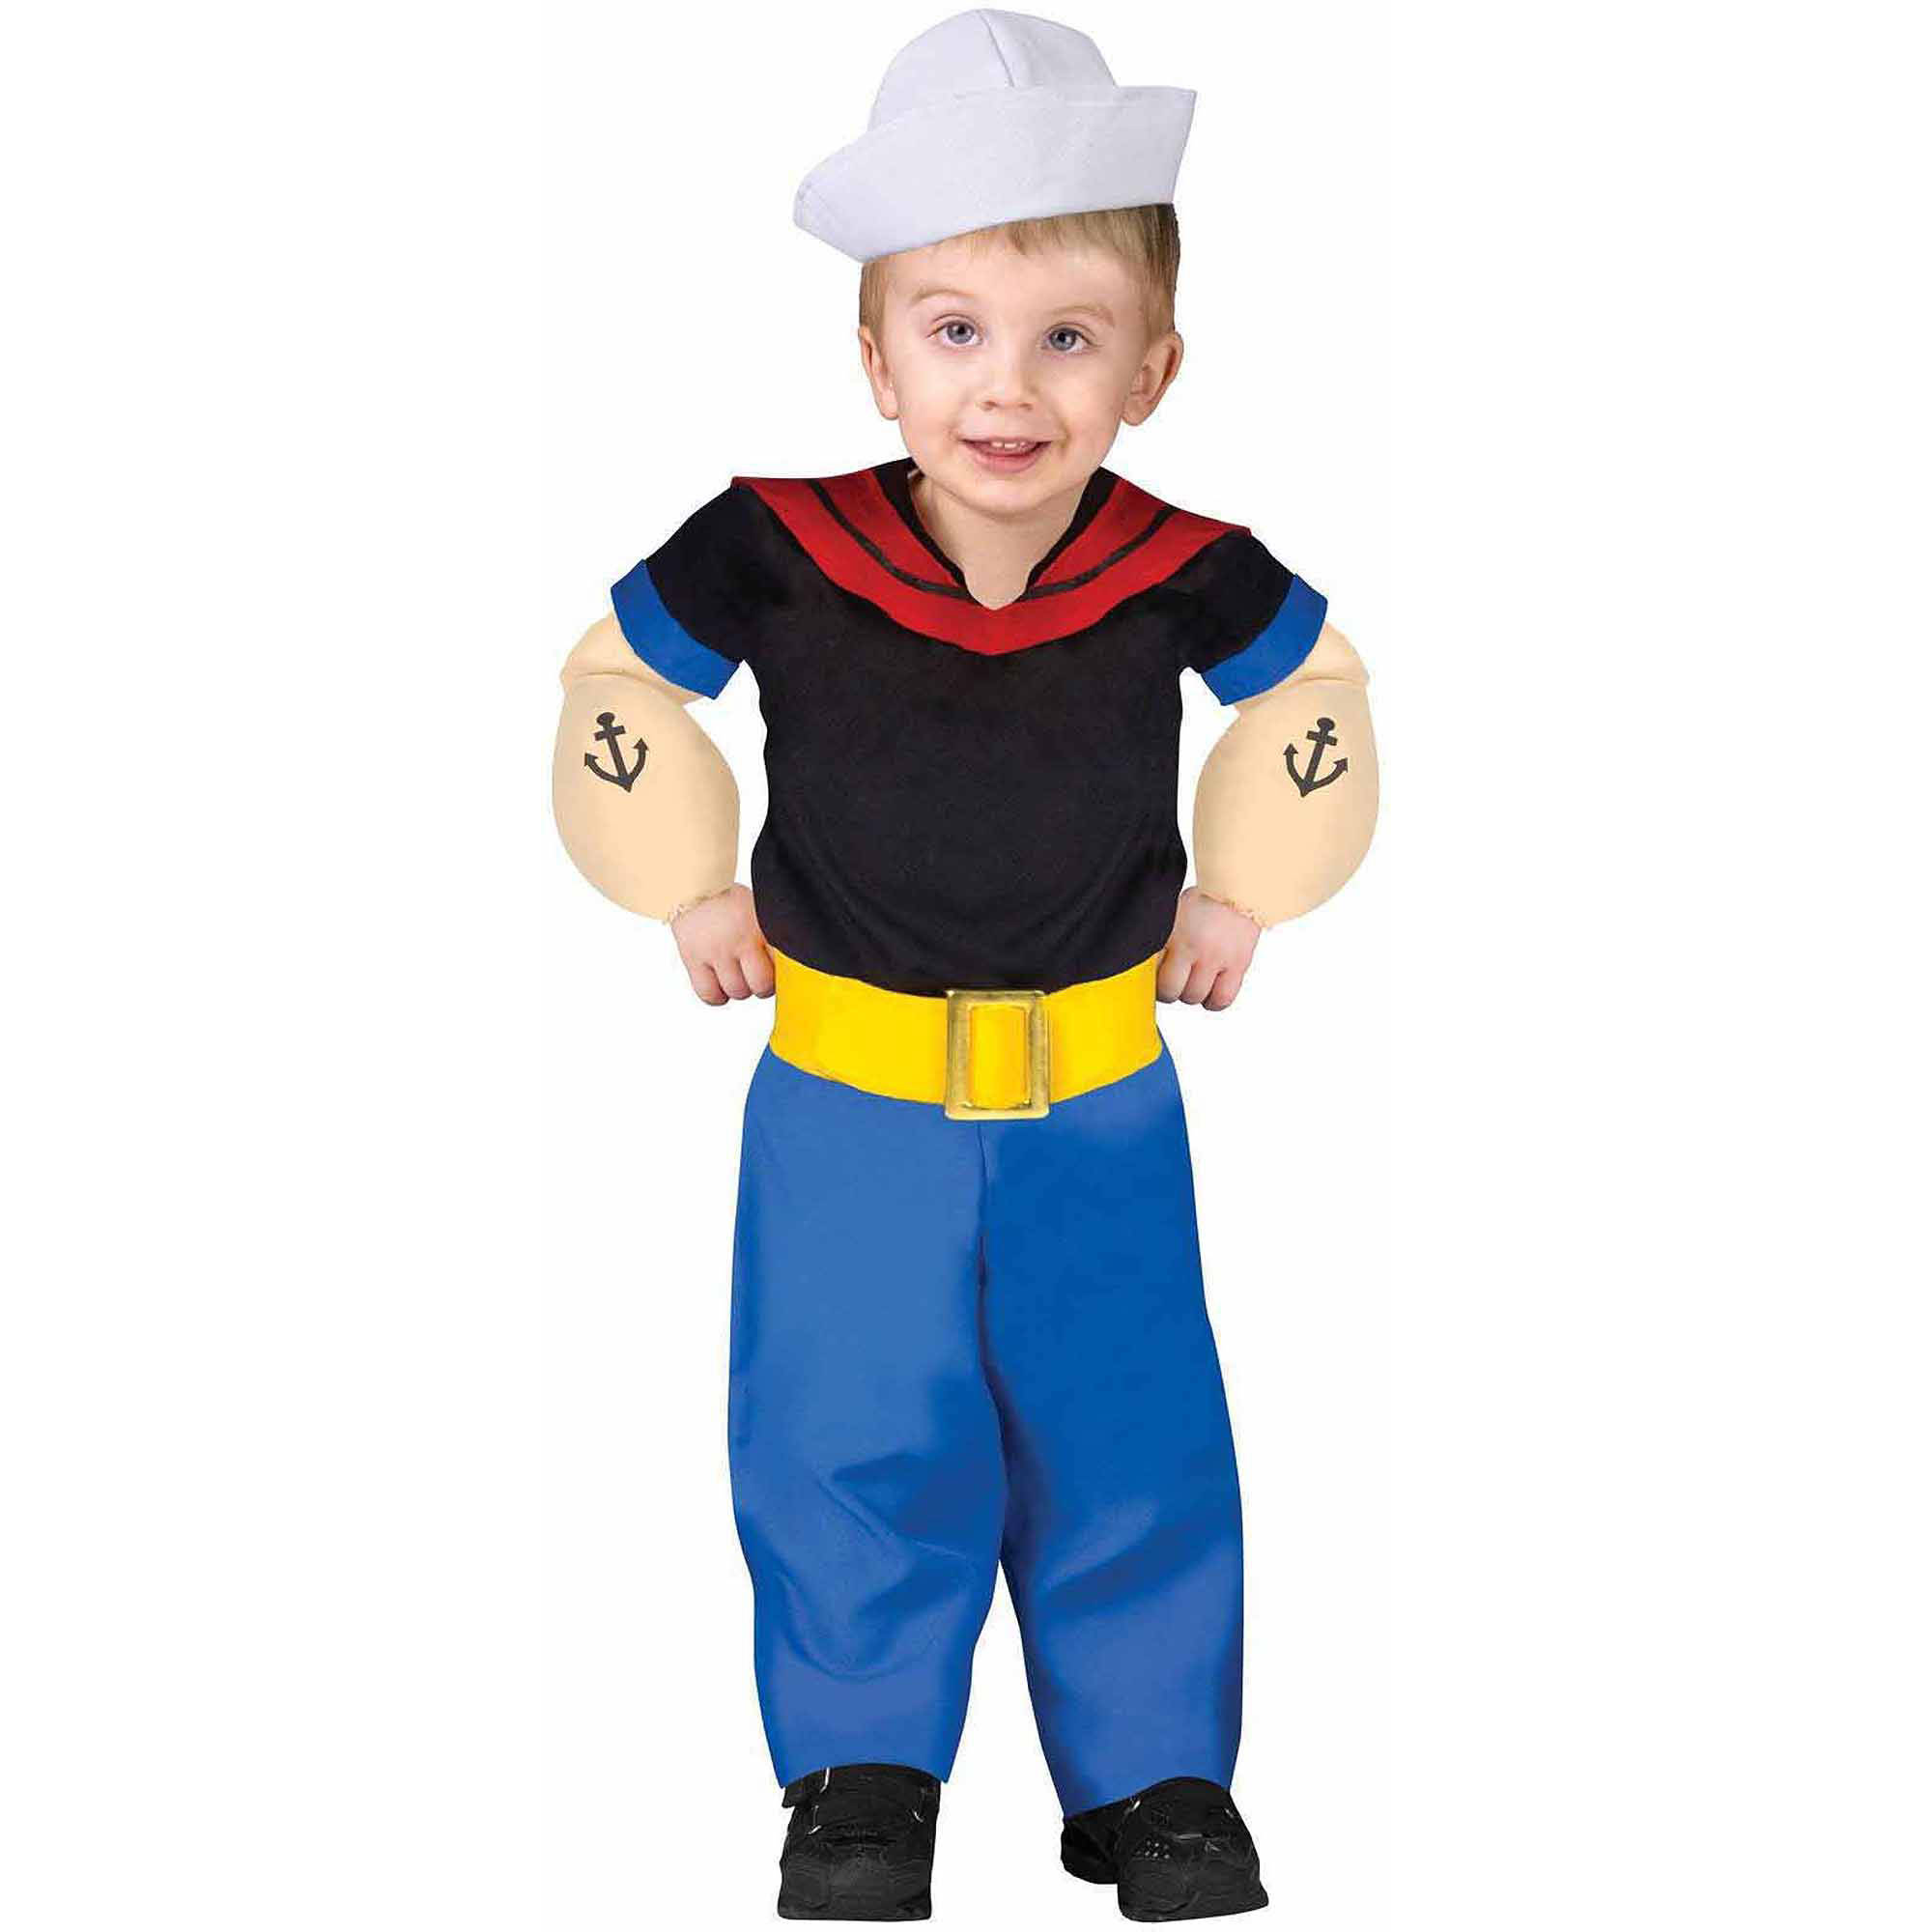 Popeye The Sailor Man Cartoon Toddler/Infant Baby Boys Costume S-L